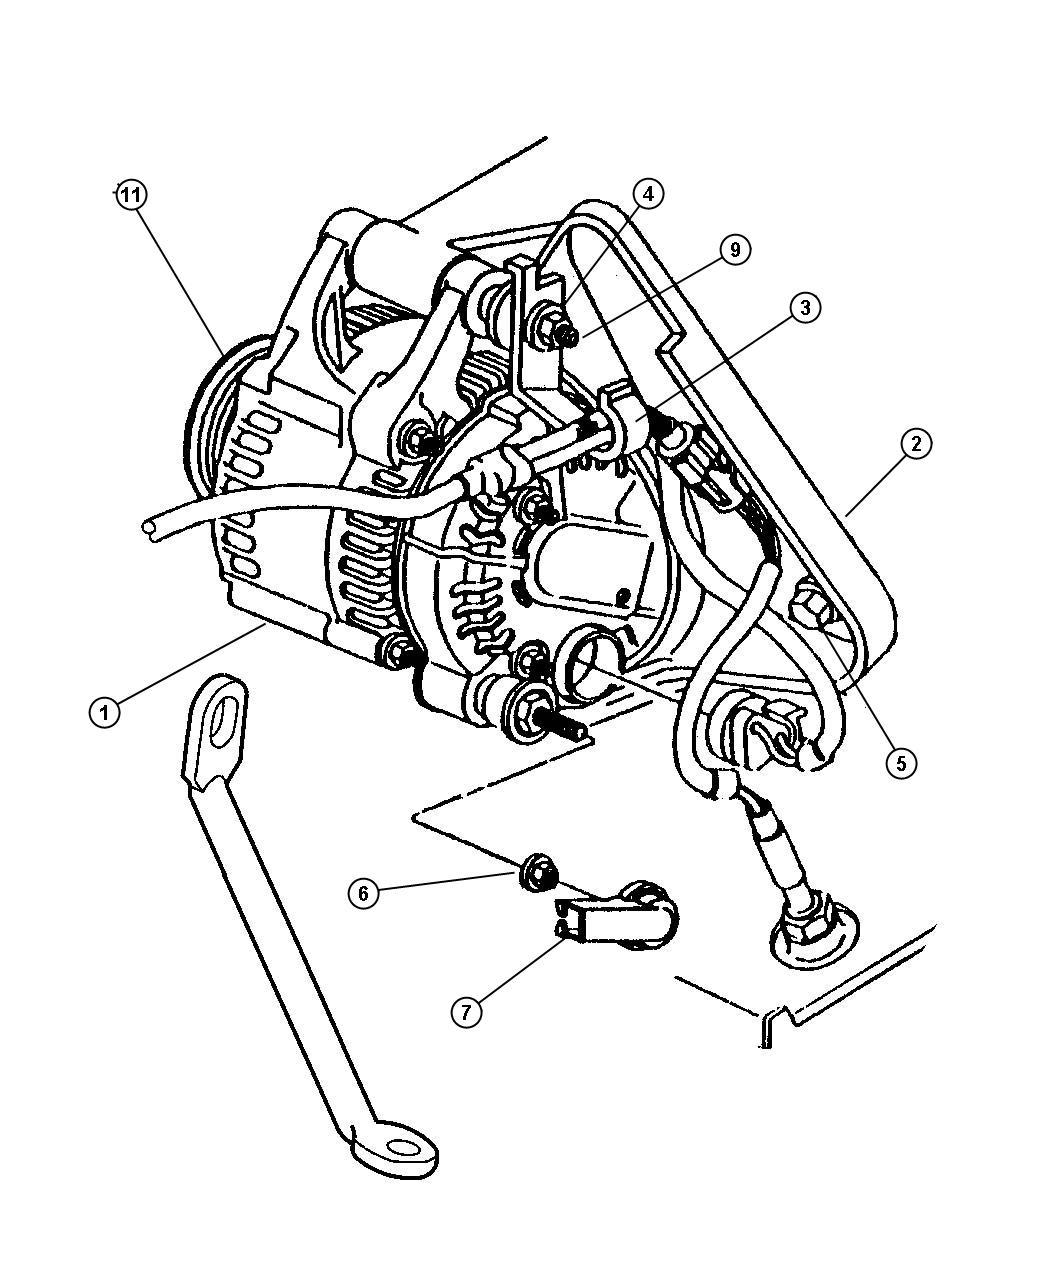 Dodge Intrepid Clip. Wiring. Transmission wiring